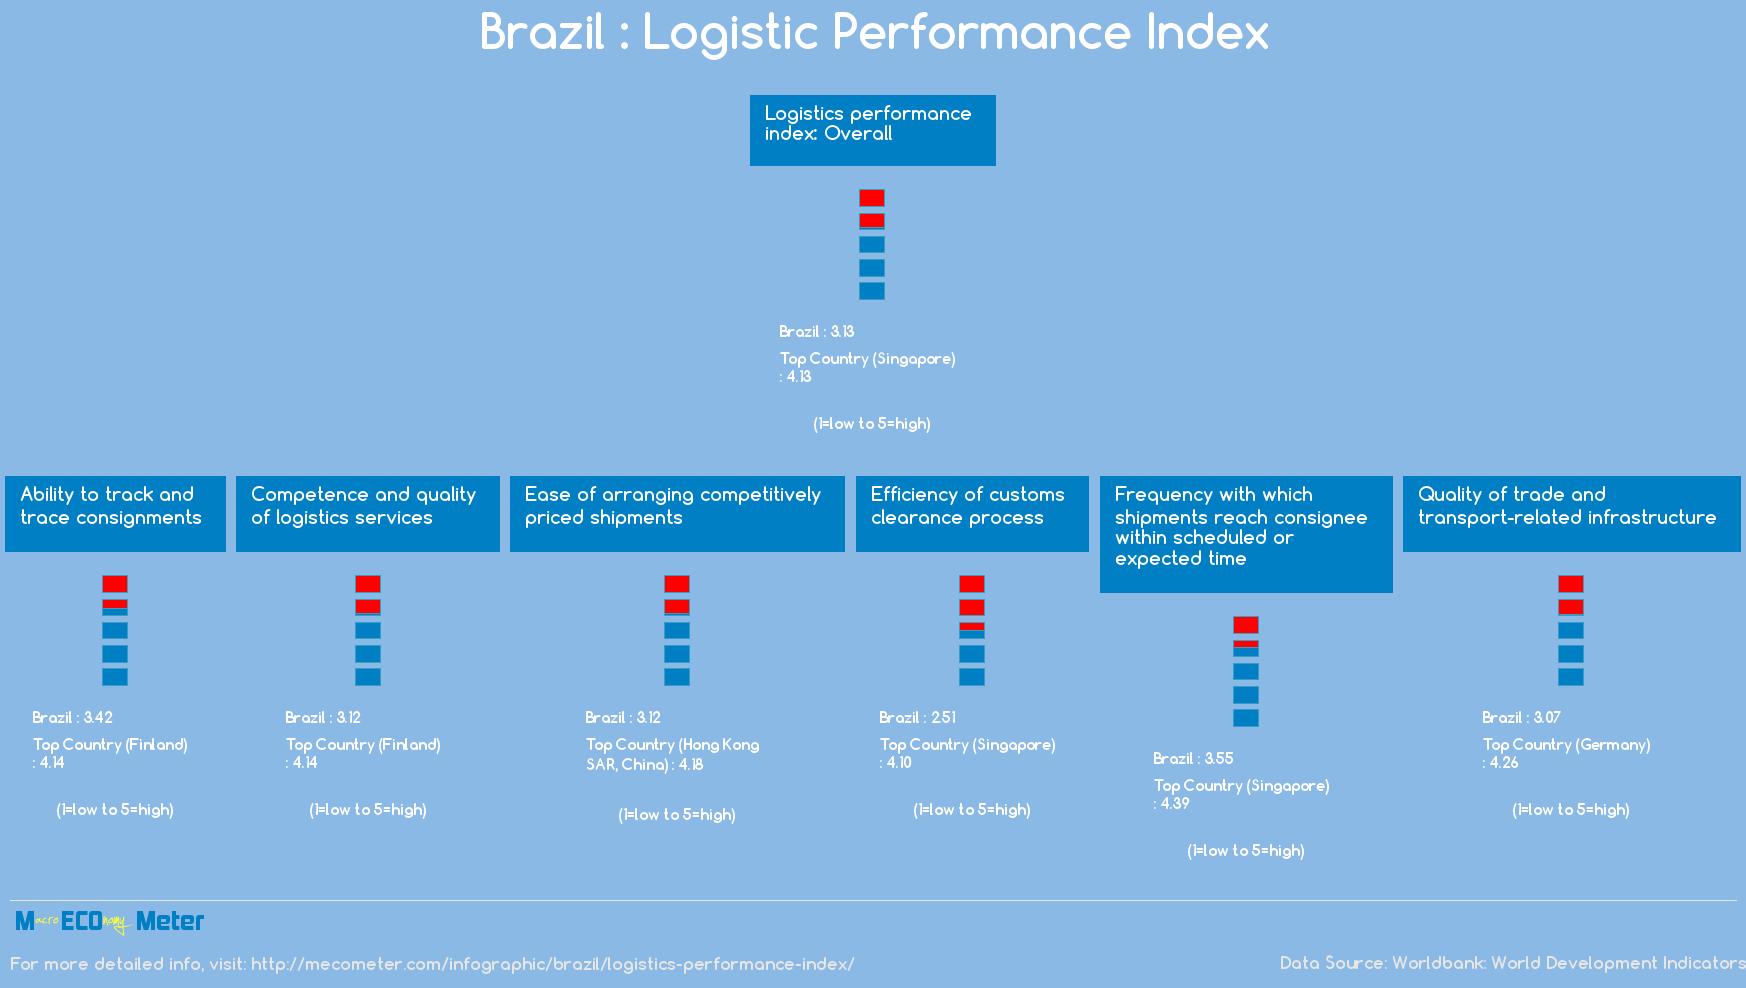 Brazil : Logistic Performance Index